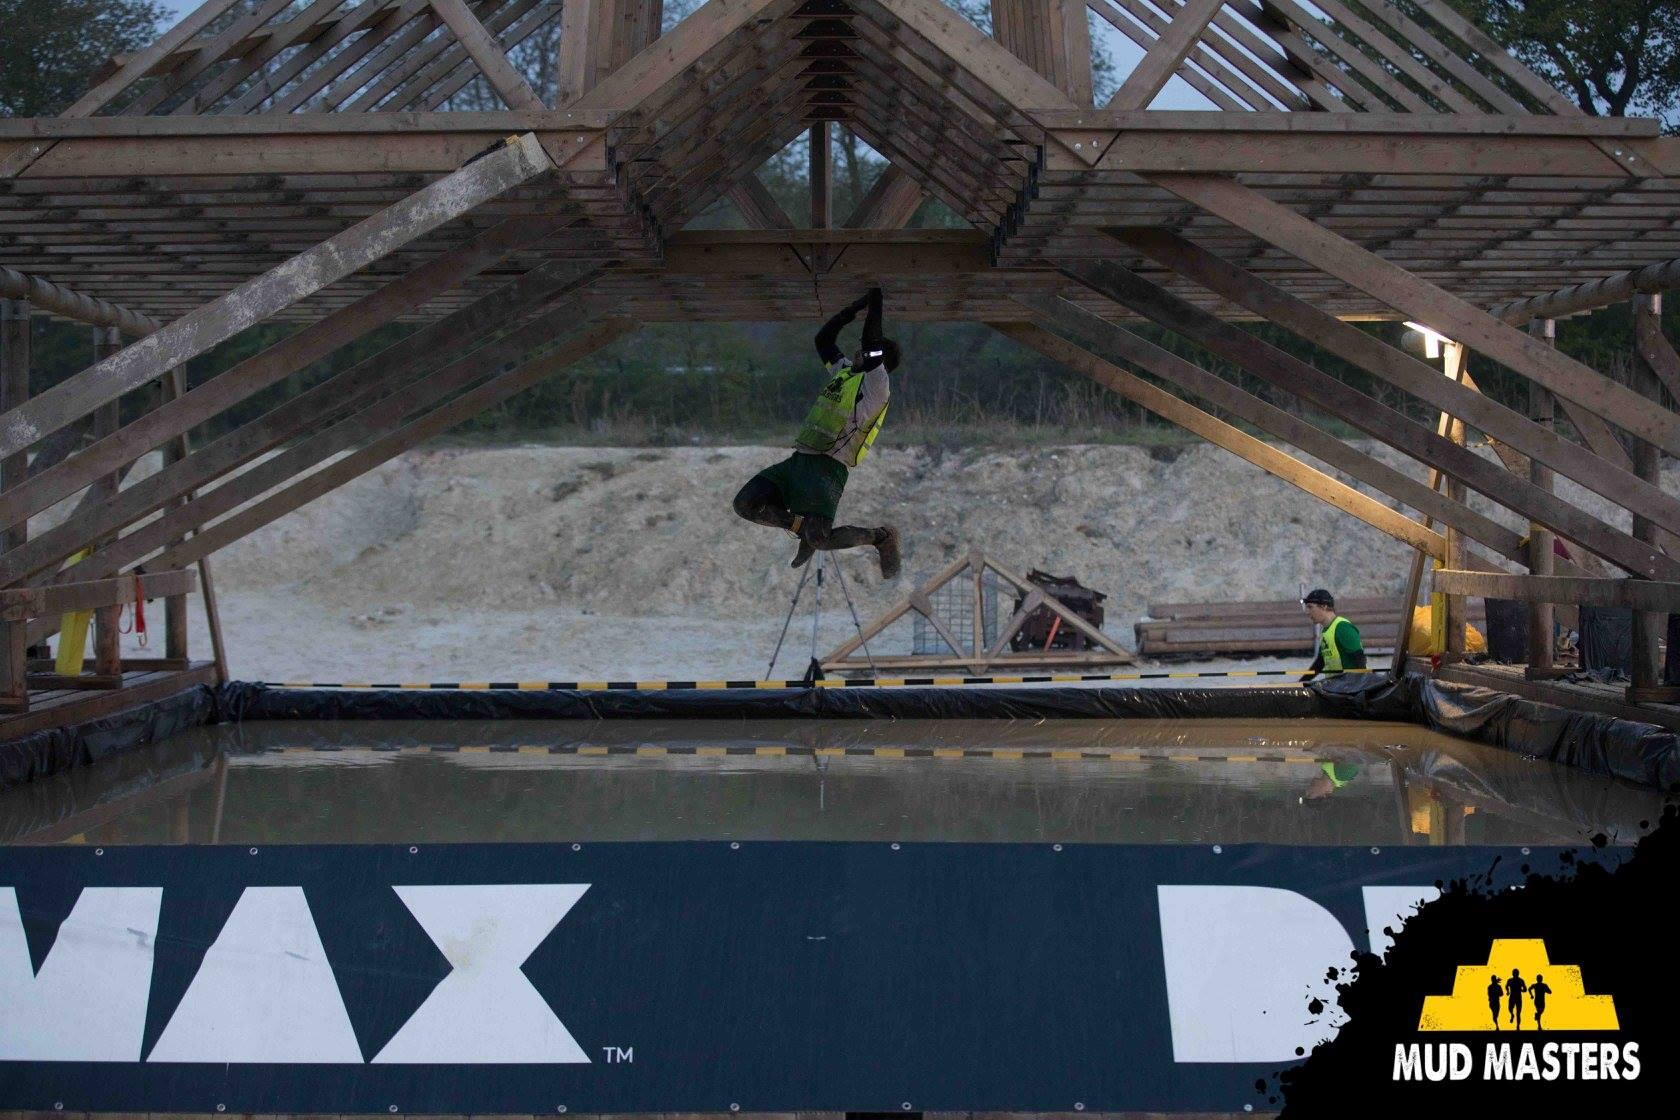 Mud Masters Obstacle Run Night Shift, Hindernislauf Deutschland, Hindernis Monkey Bars